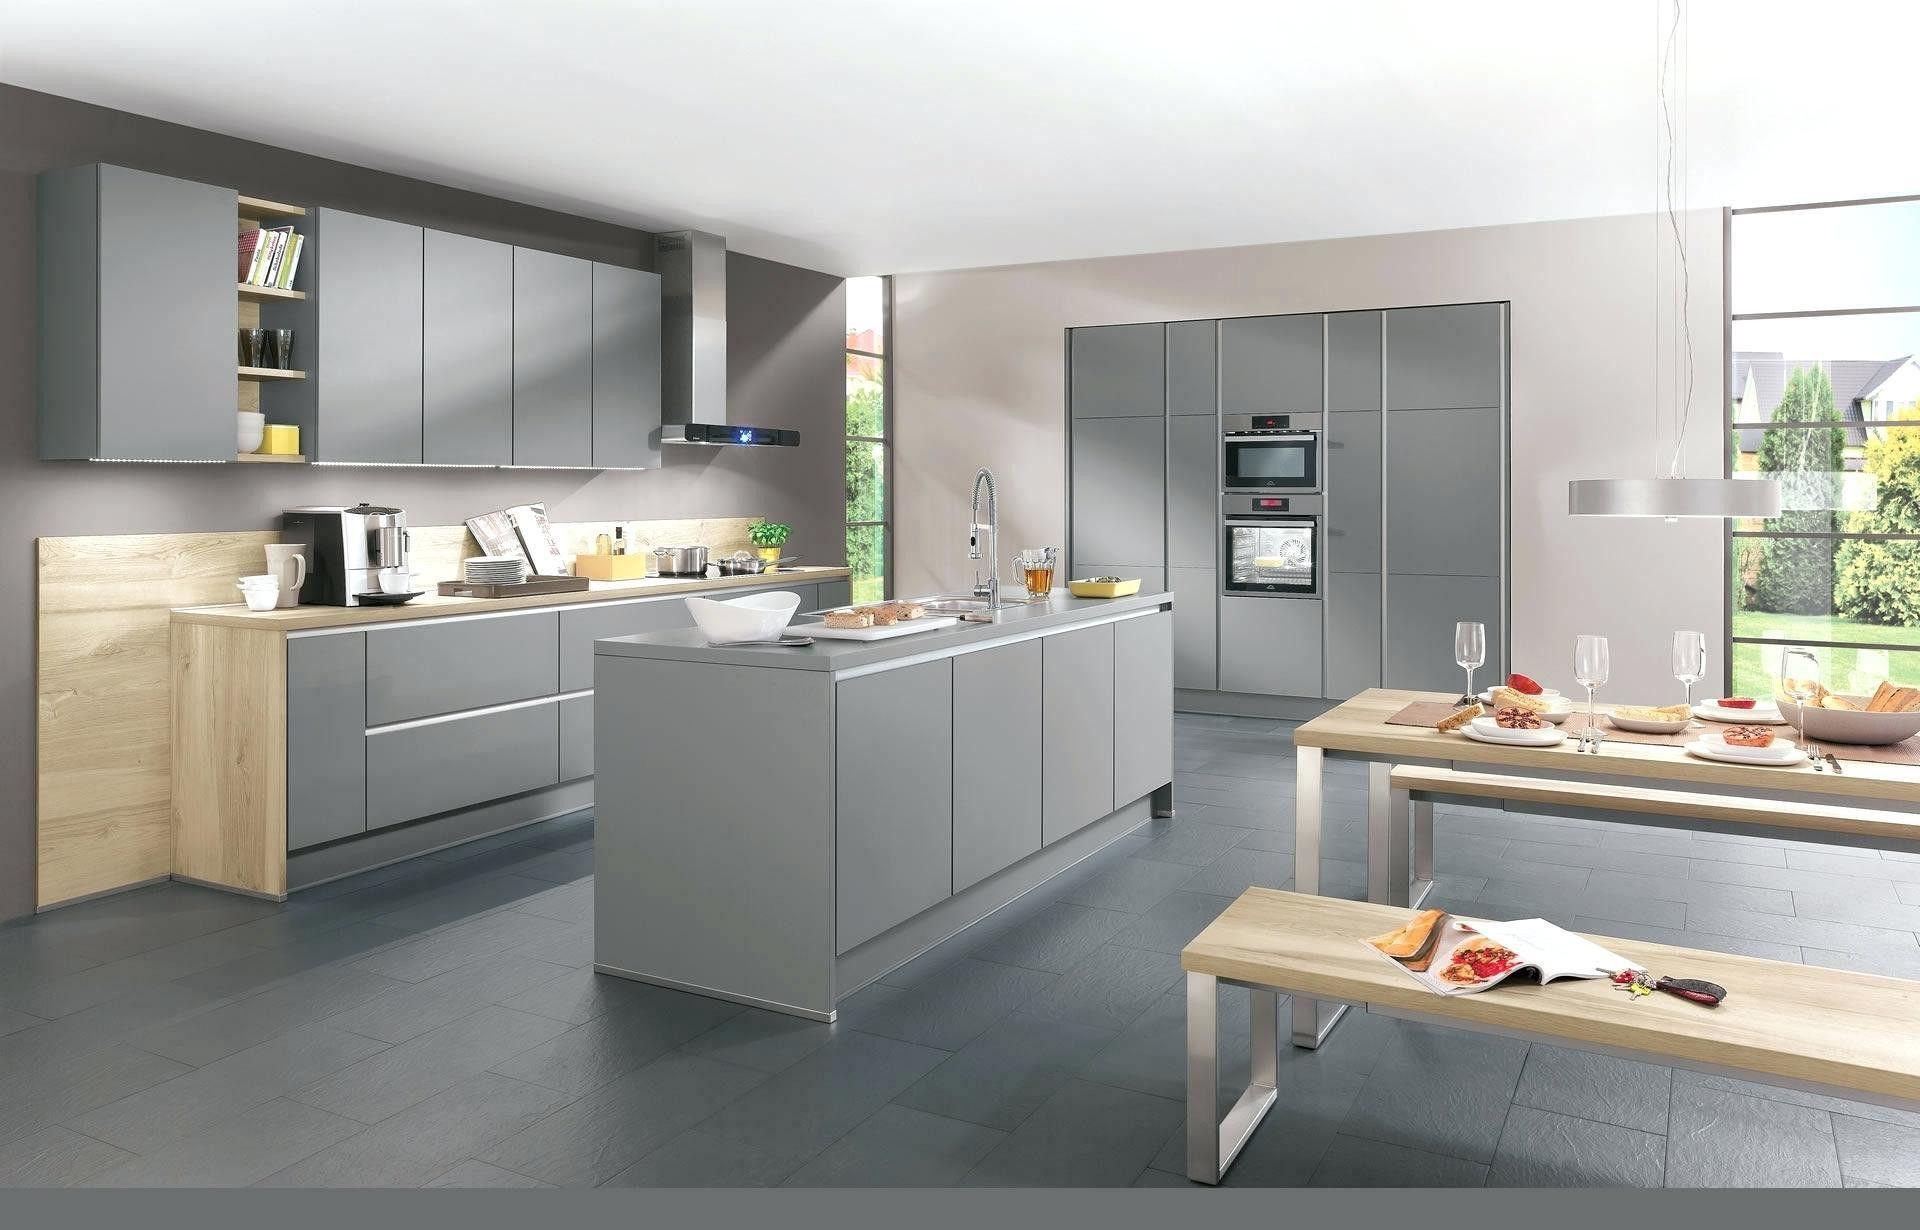 Nobilia Küche Planen Lovely Nobilia Küche Line Kaufen Groß Nobilia